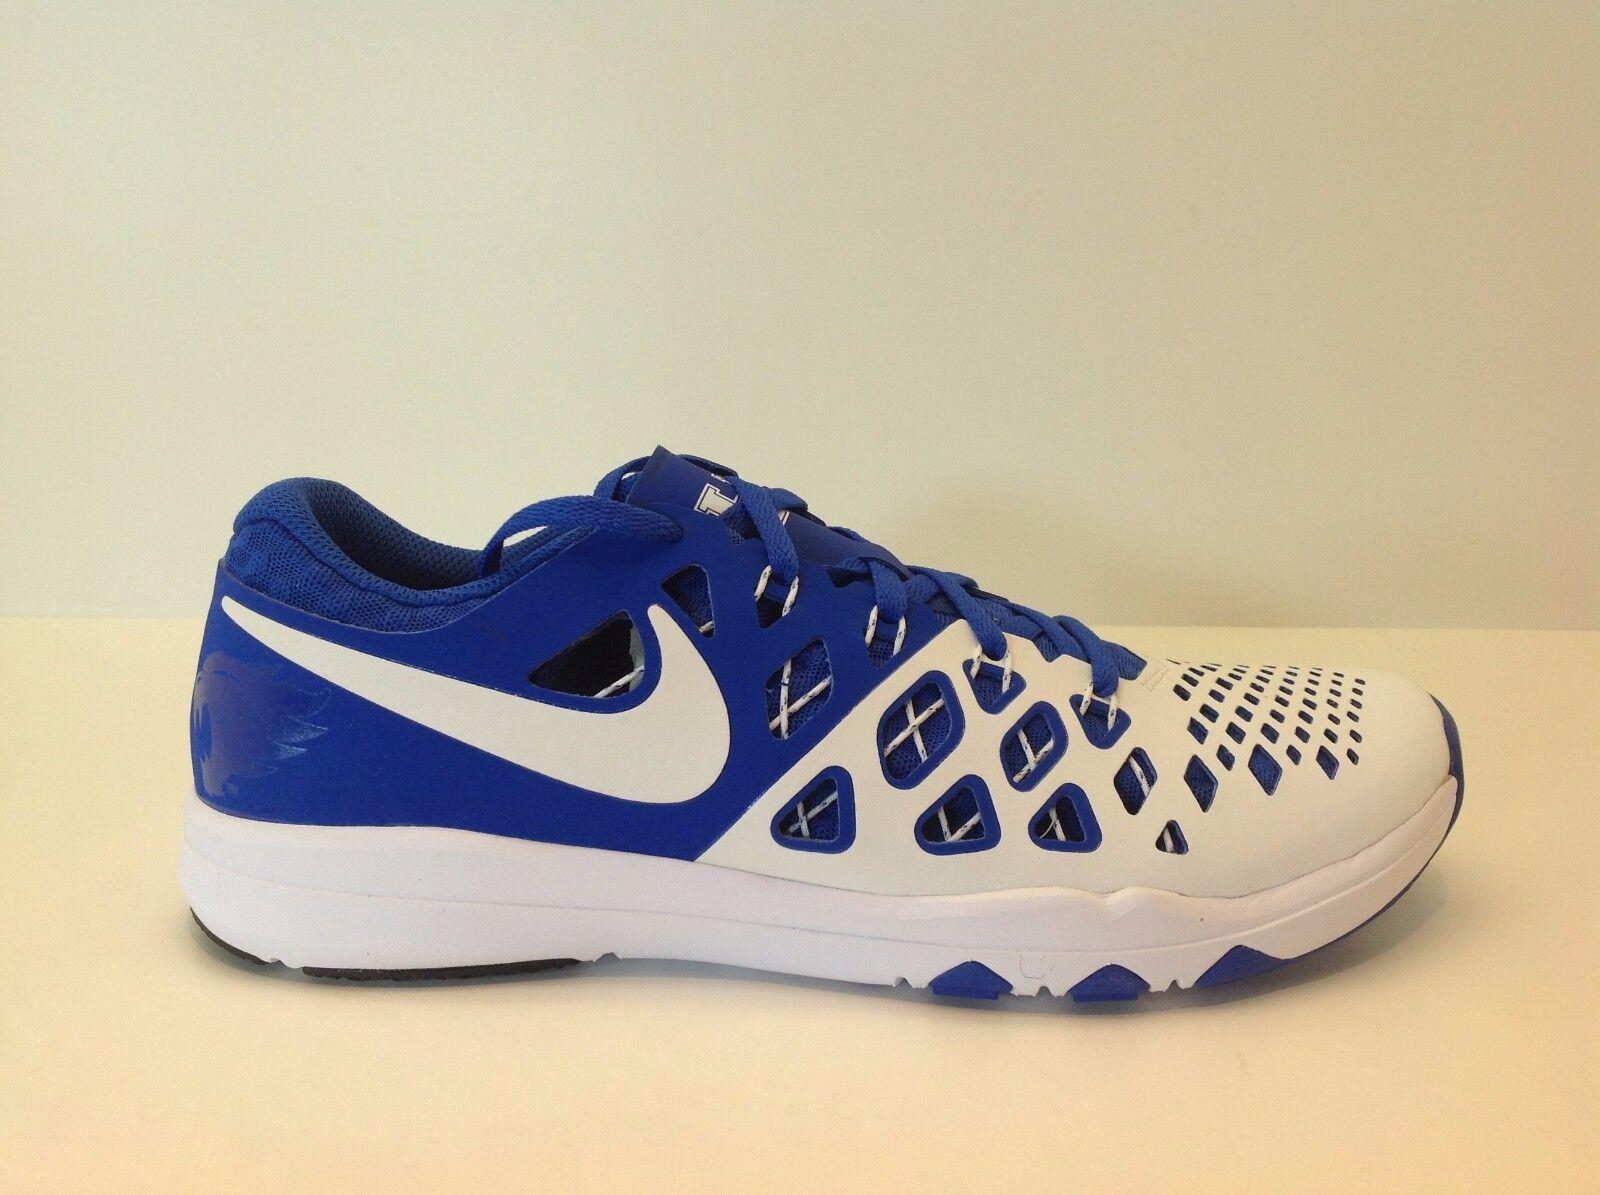 Nike Train Speed 4 Amp Men's Size 8-12 Royal/White New in Box 844102 411